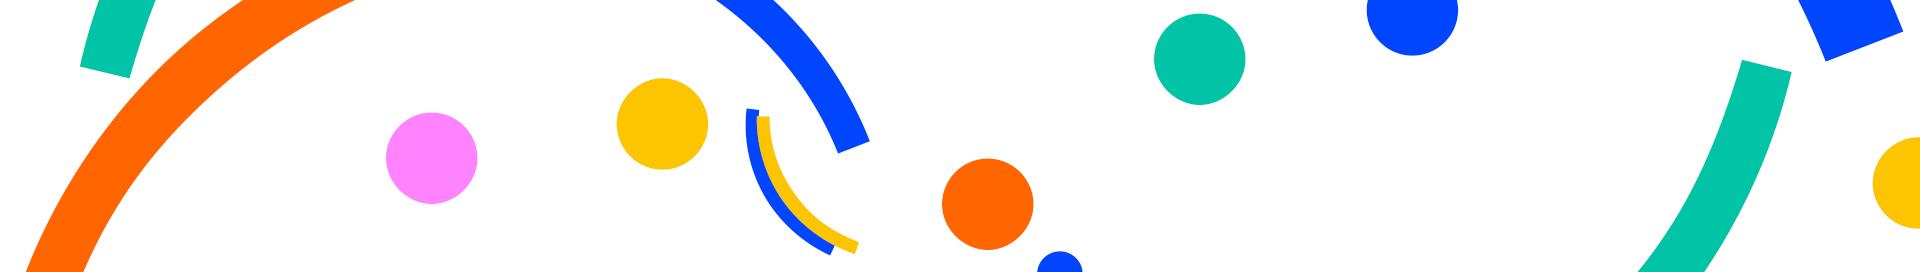 lkj-headerbild6